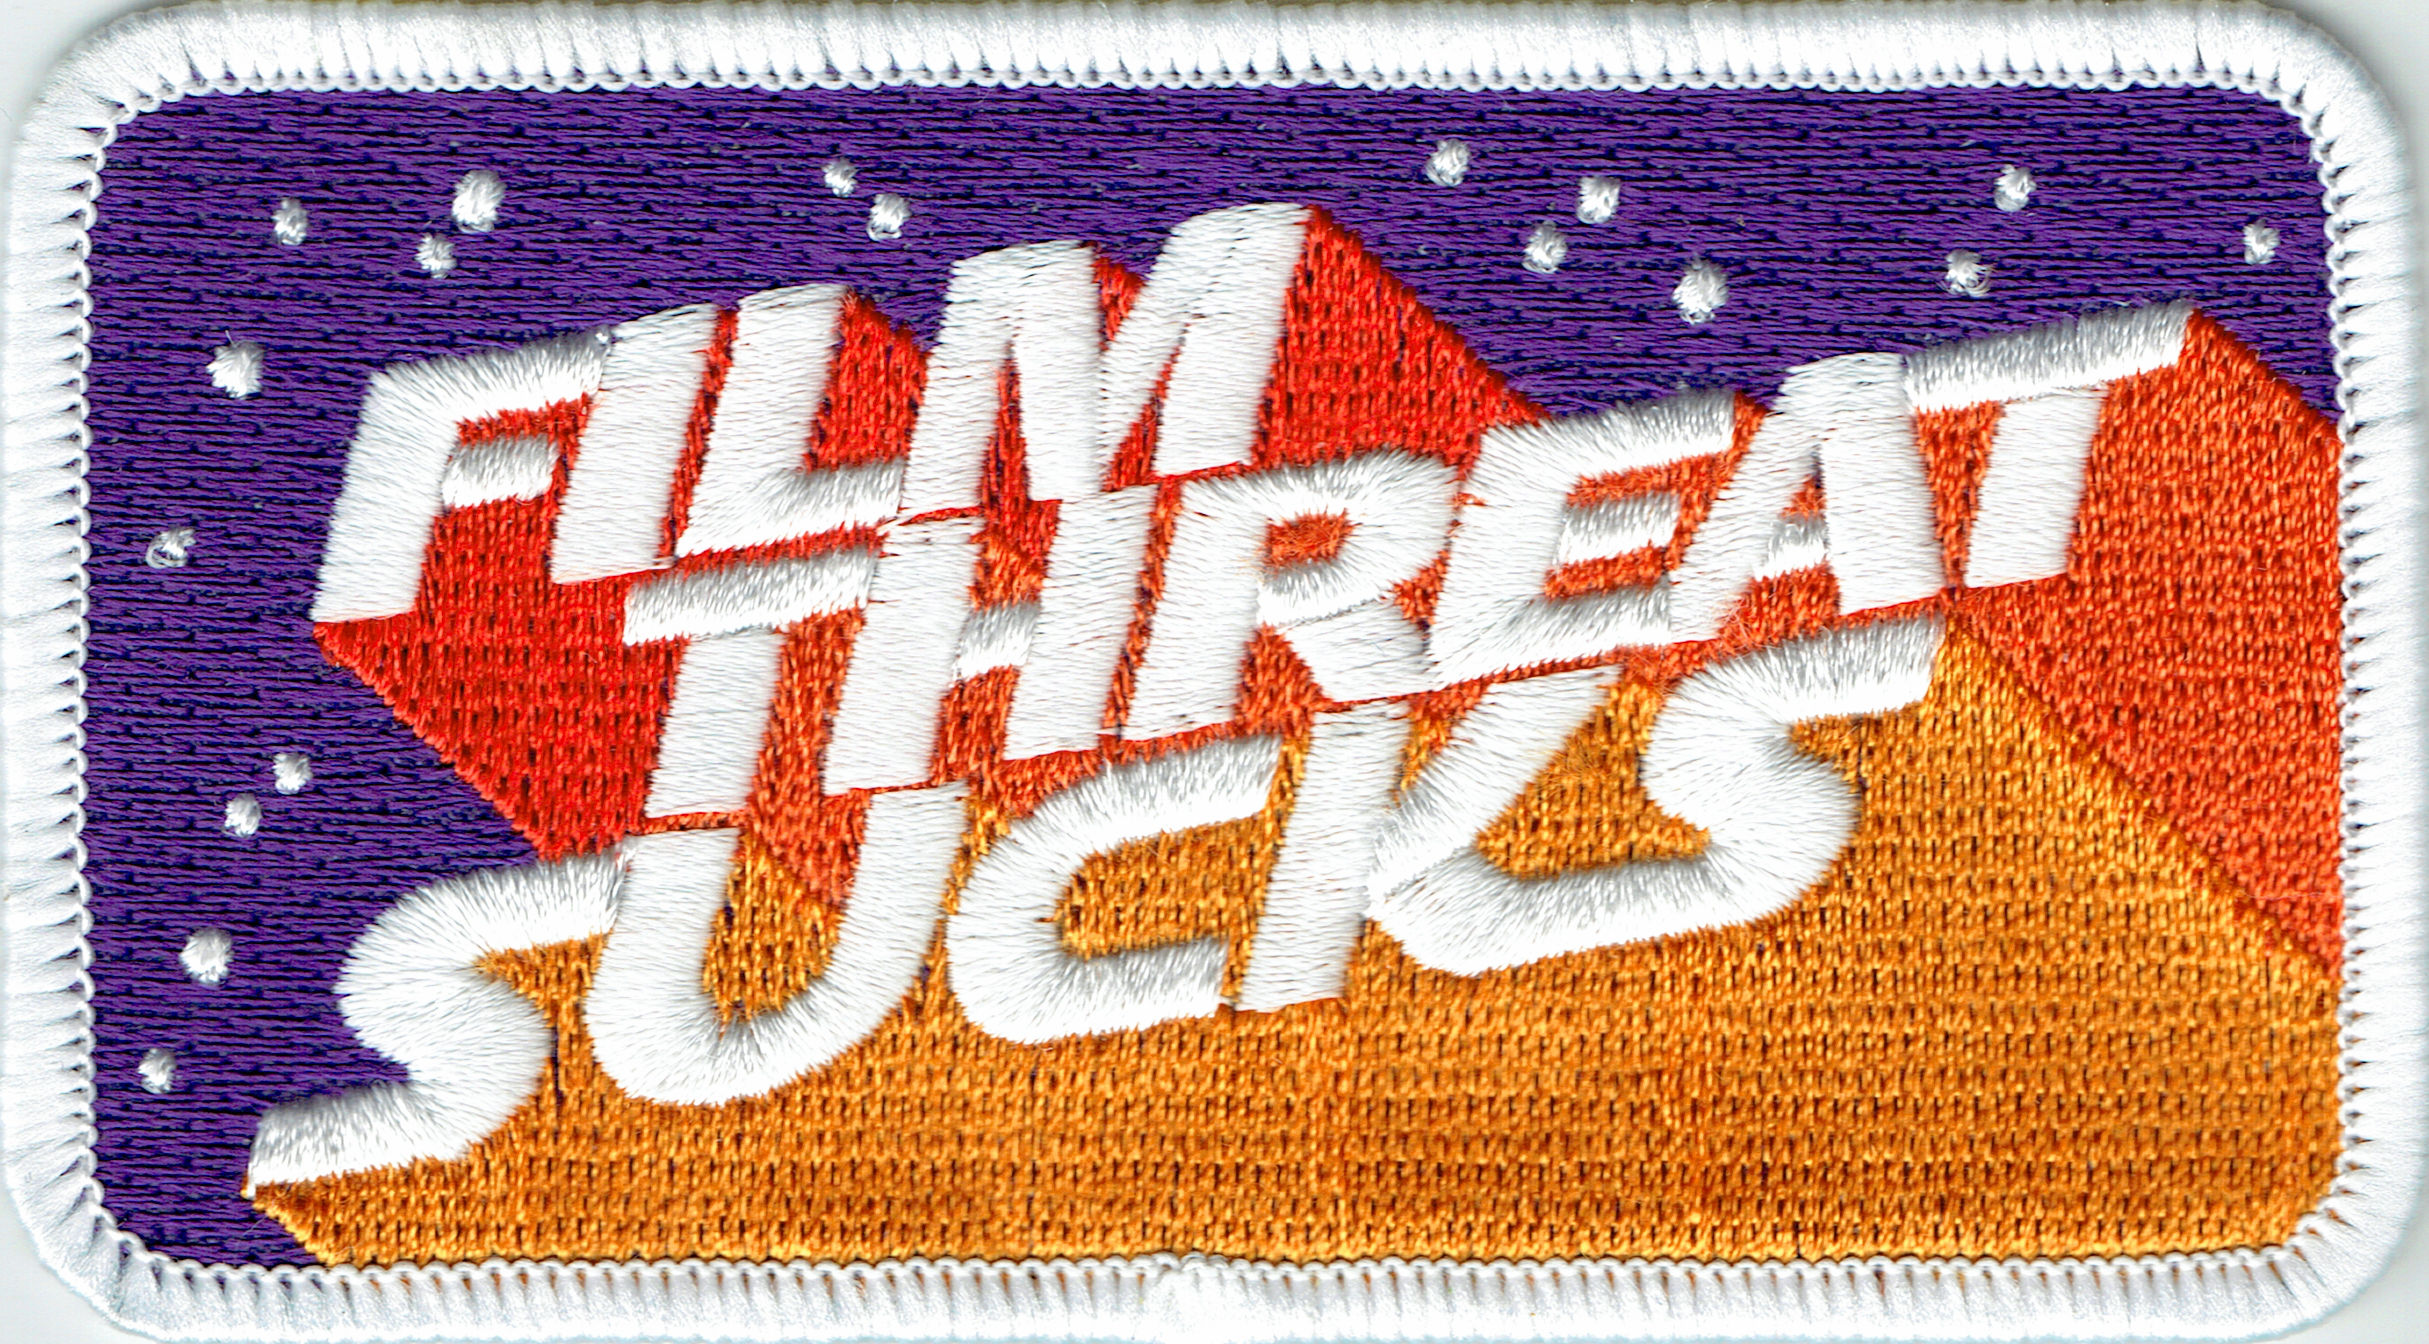 A Film Threat Sucks fabric patch.